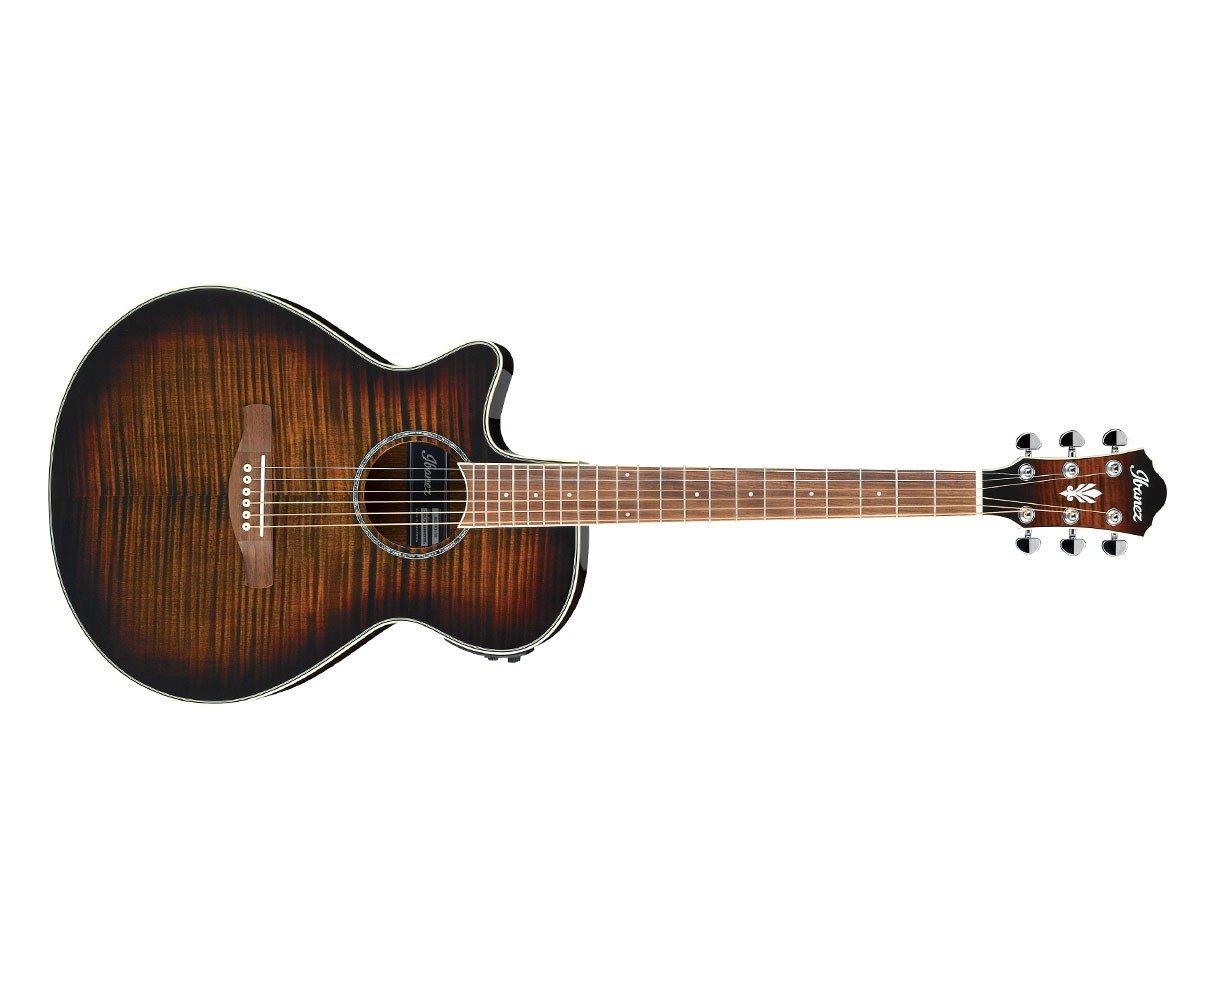 Ibanez AEG19II Lefty Acoustic Electric Guitar, Tiger Burst